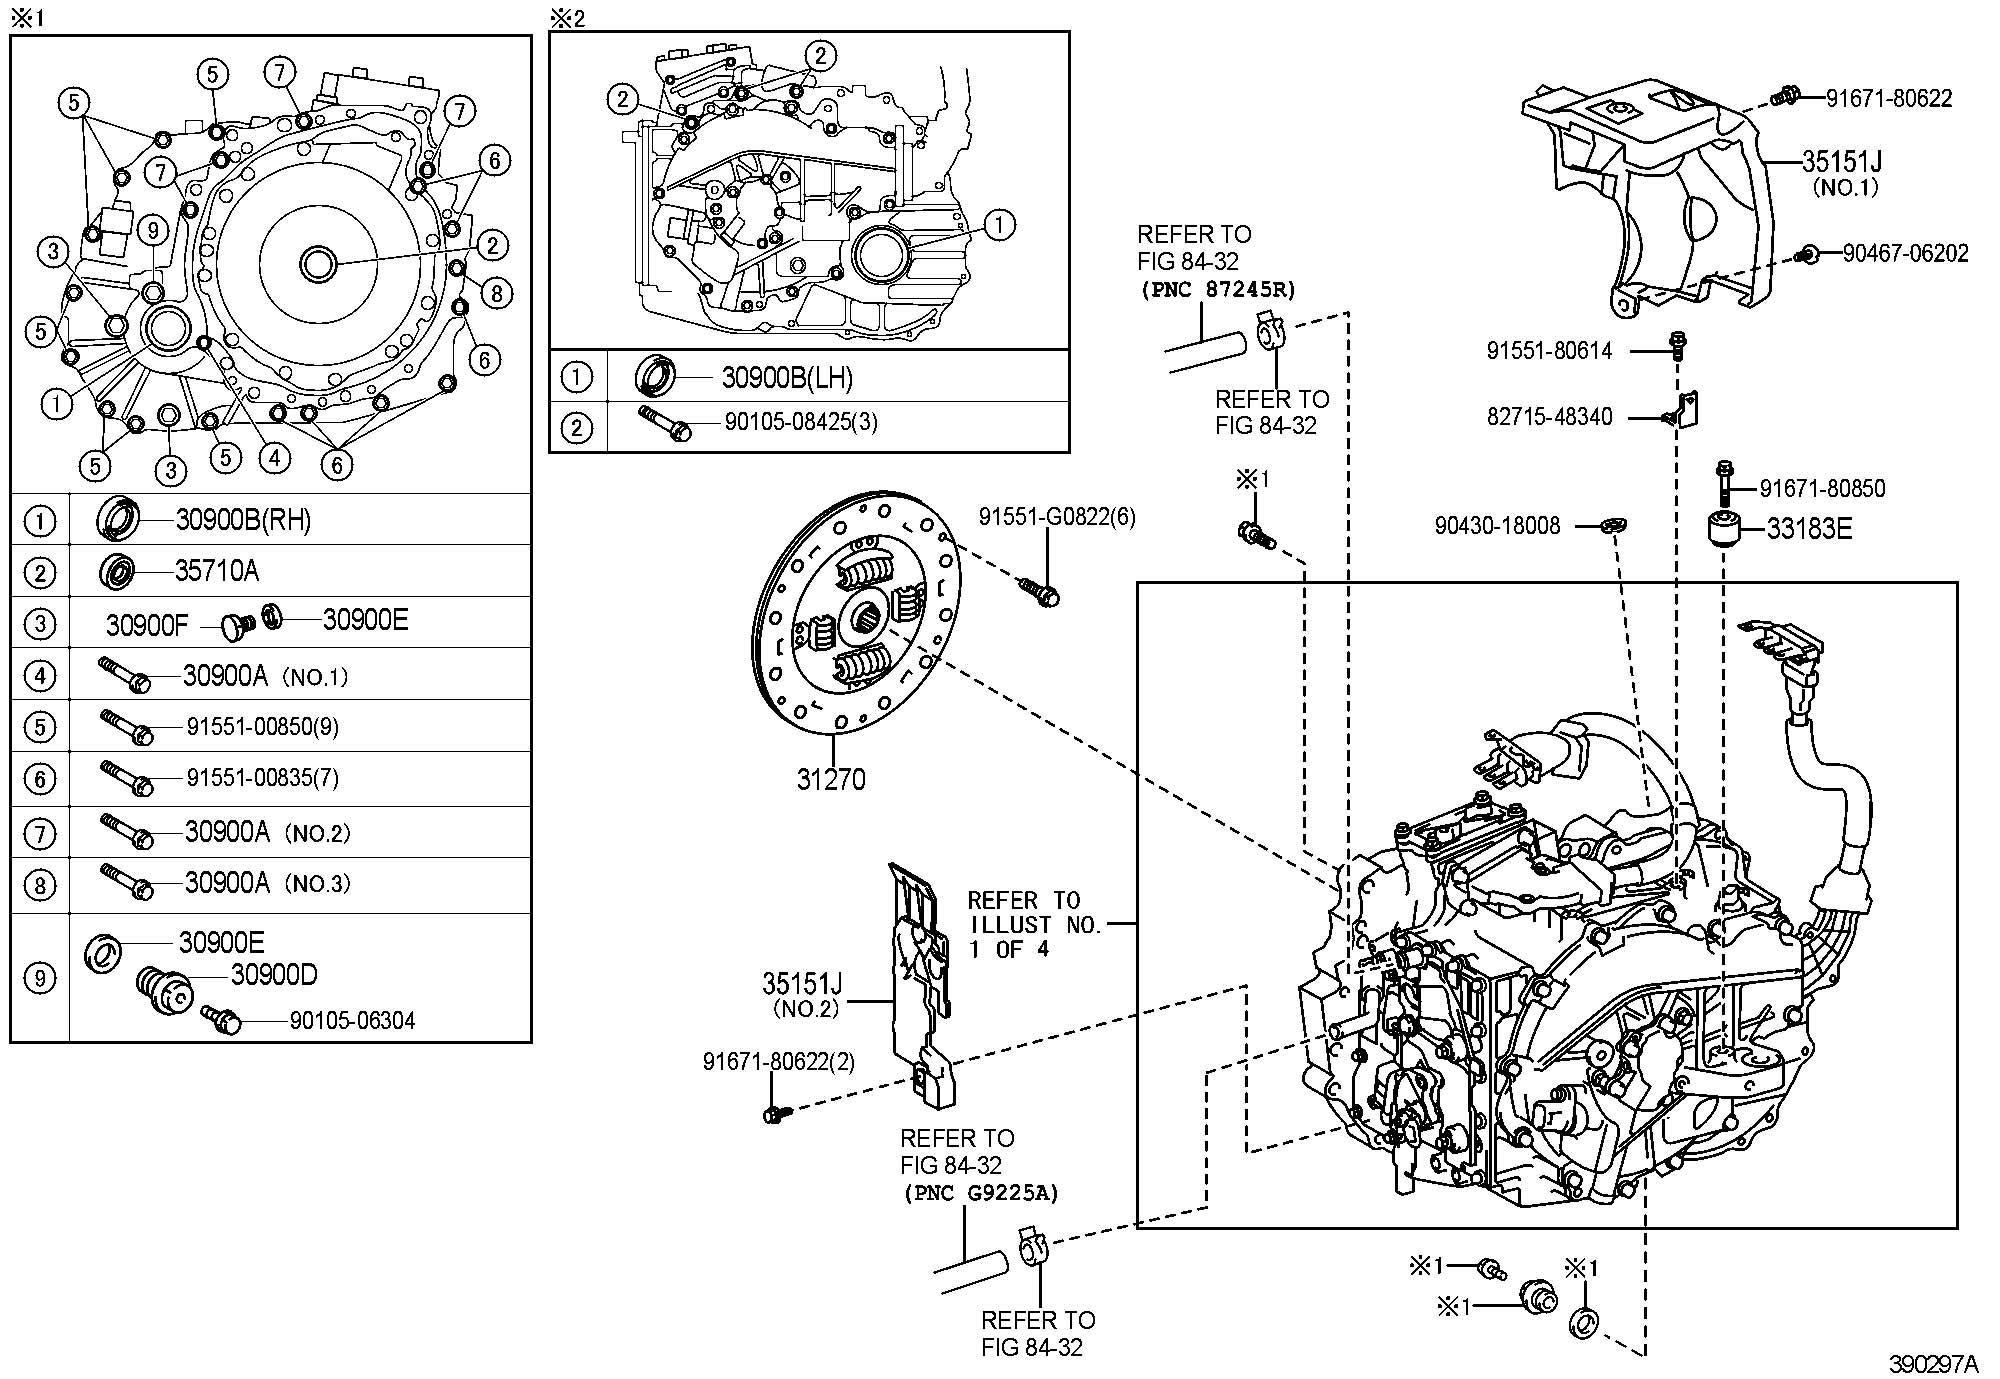 2000 Toyota Bolt (for hybrid vehicle transaxle & engine